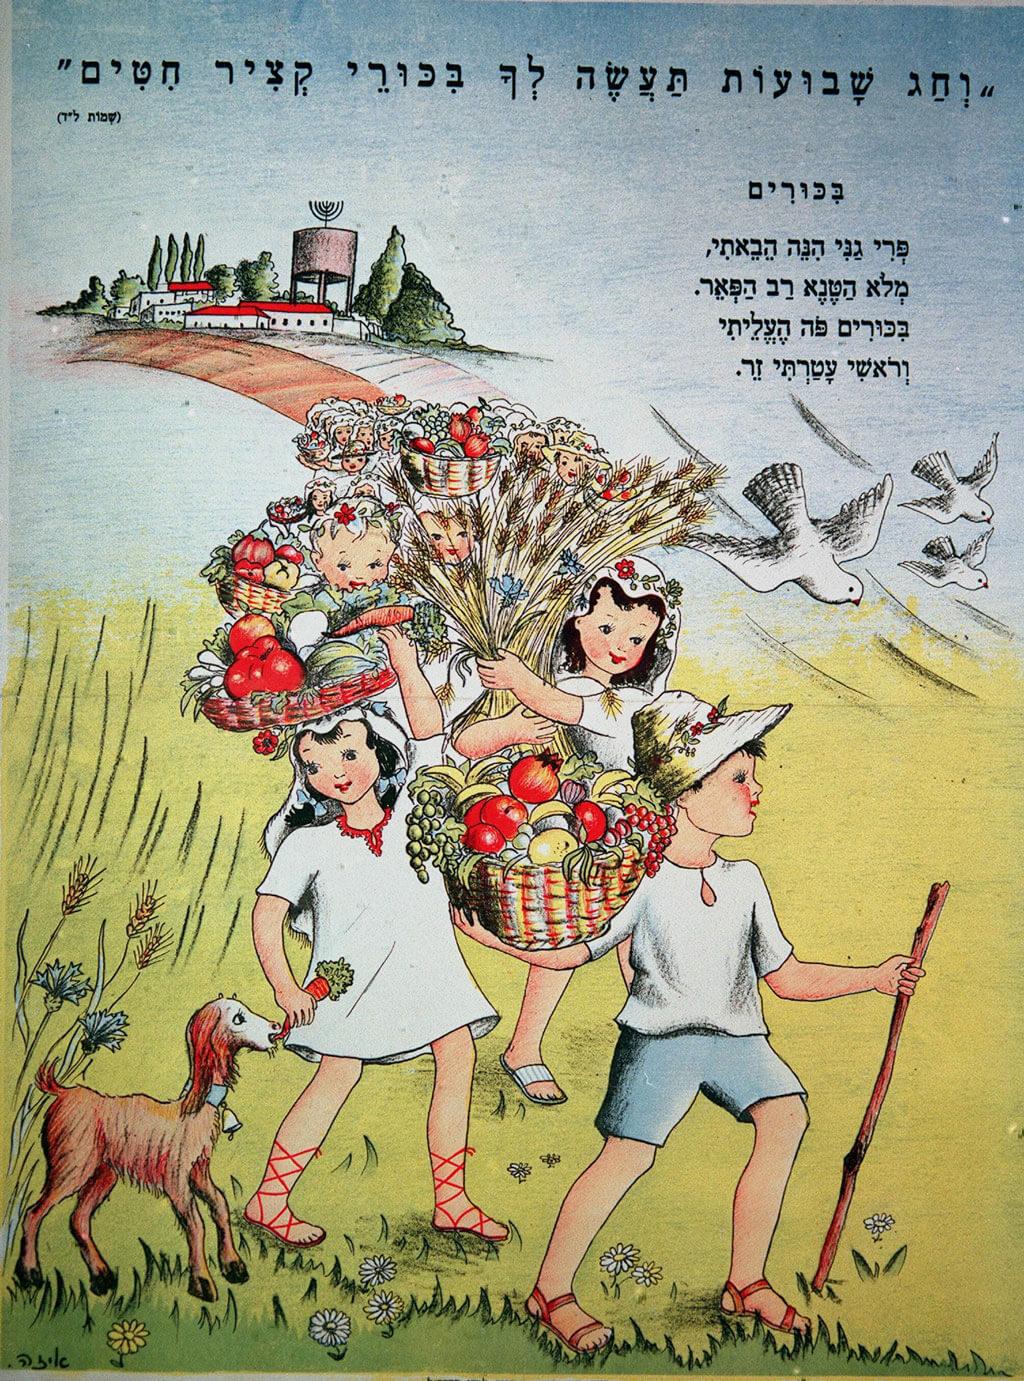 shavuot שבועות || A poster from the late 1940's depicting the Shavuot (Feast of Pentecost) Holiday. עלון מסוף שנות ה-40 לכבוד חג השבועות